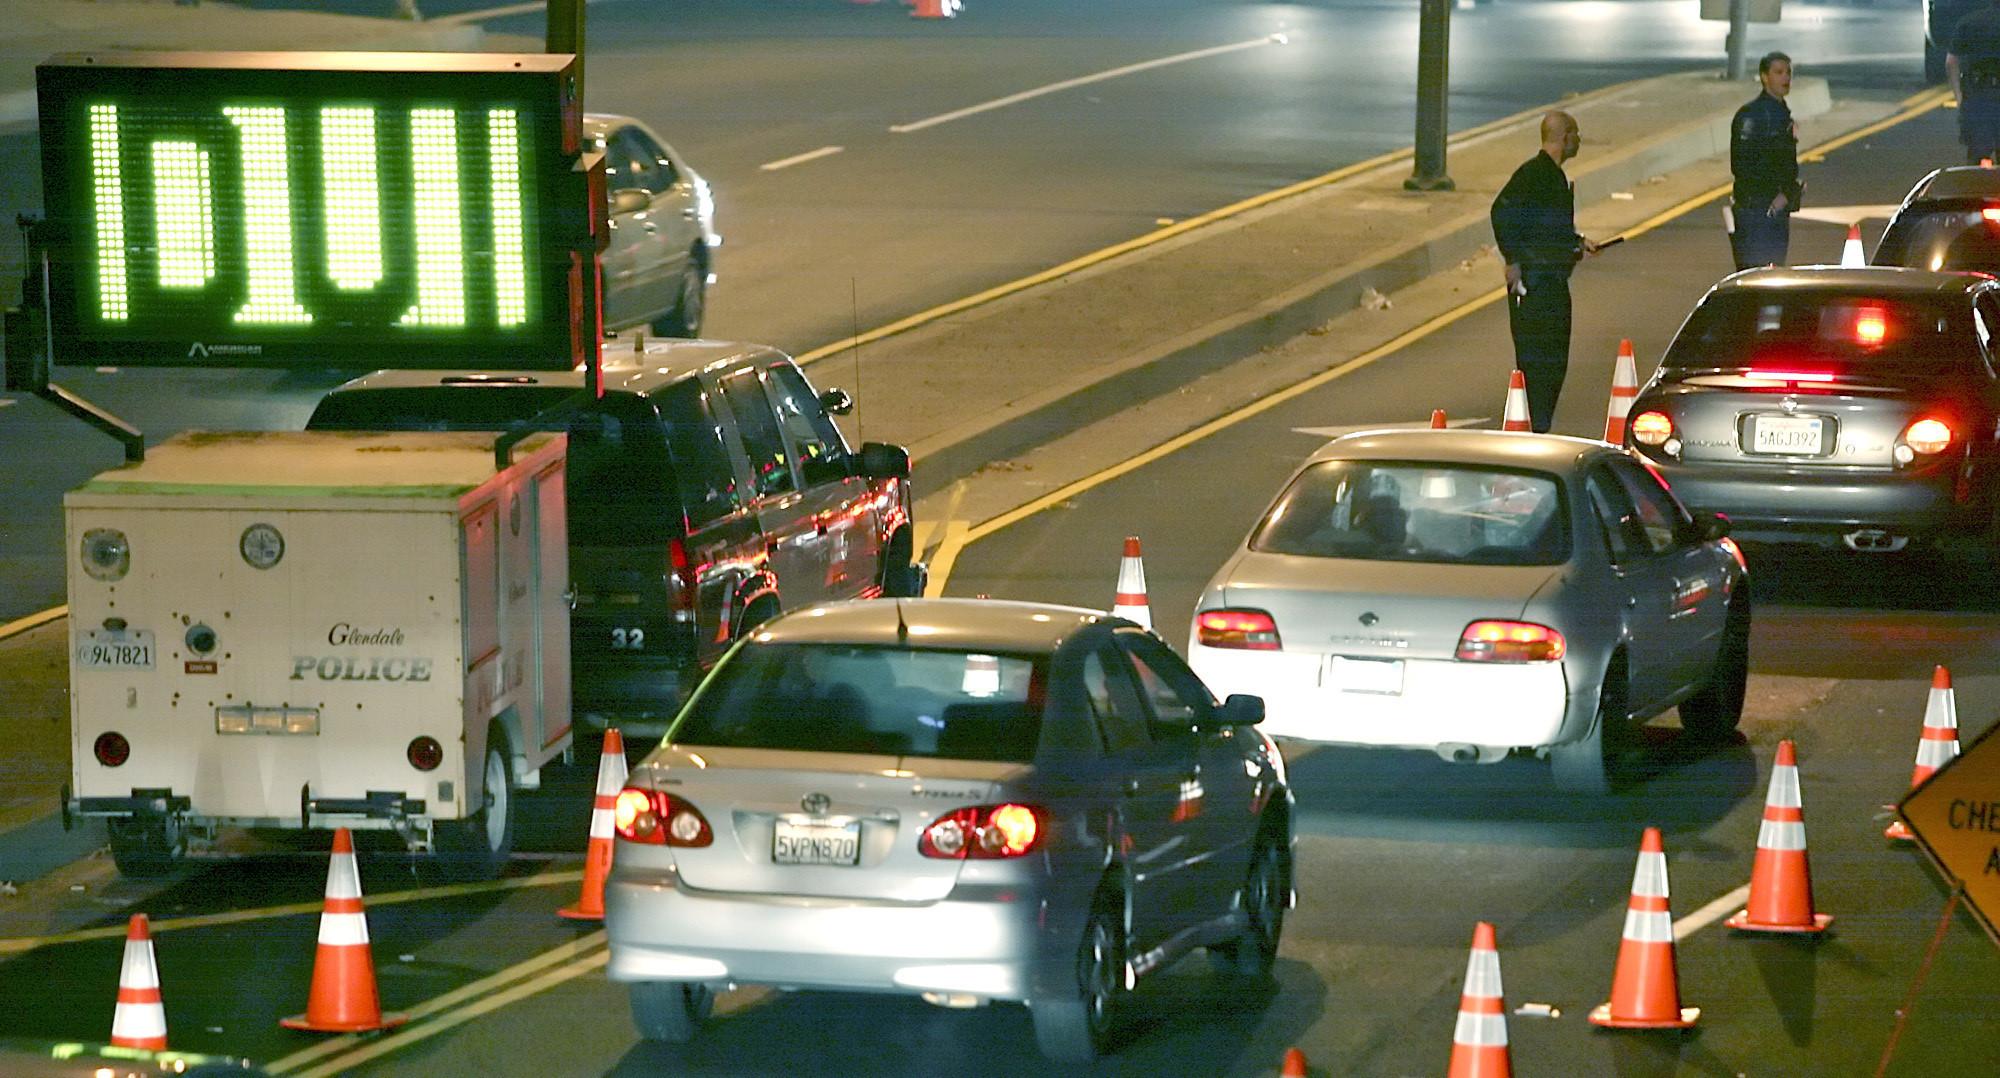 Cars line up at a DUI checkpoint on Los Feliz Boulevard at San Fernando Road in Glendale. (Roger Wilson / Glendale News Press)